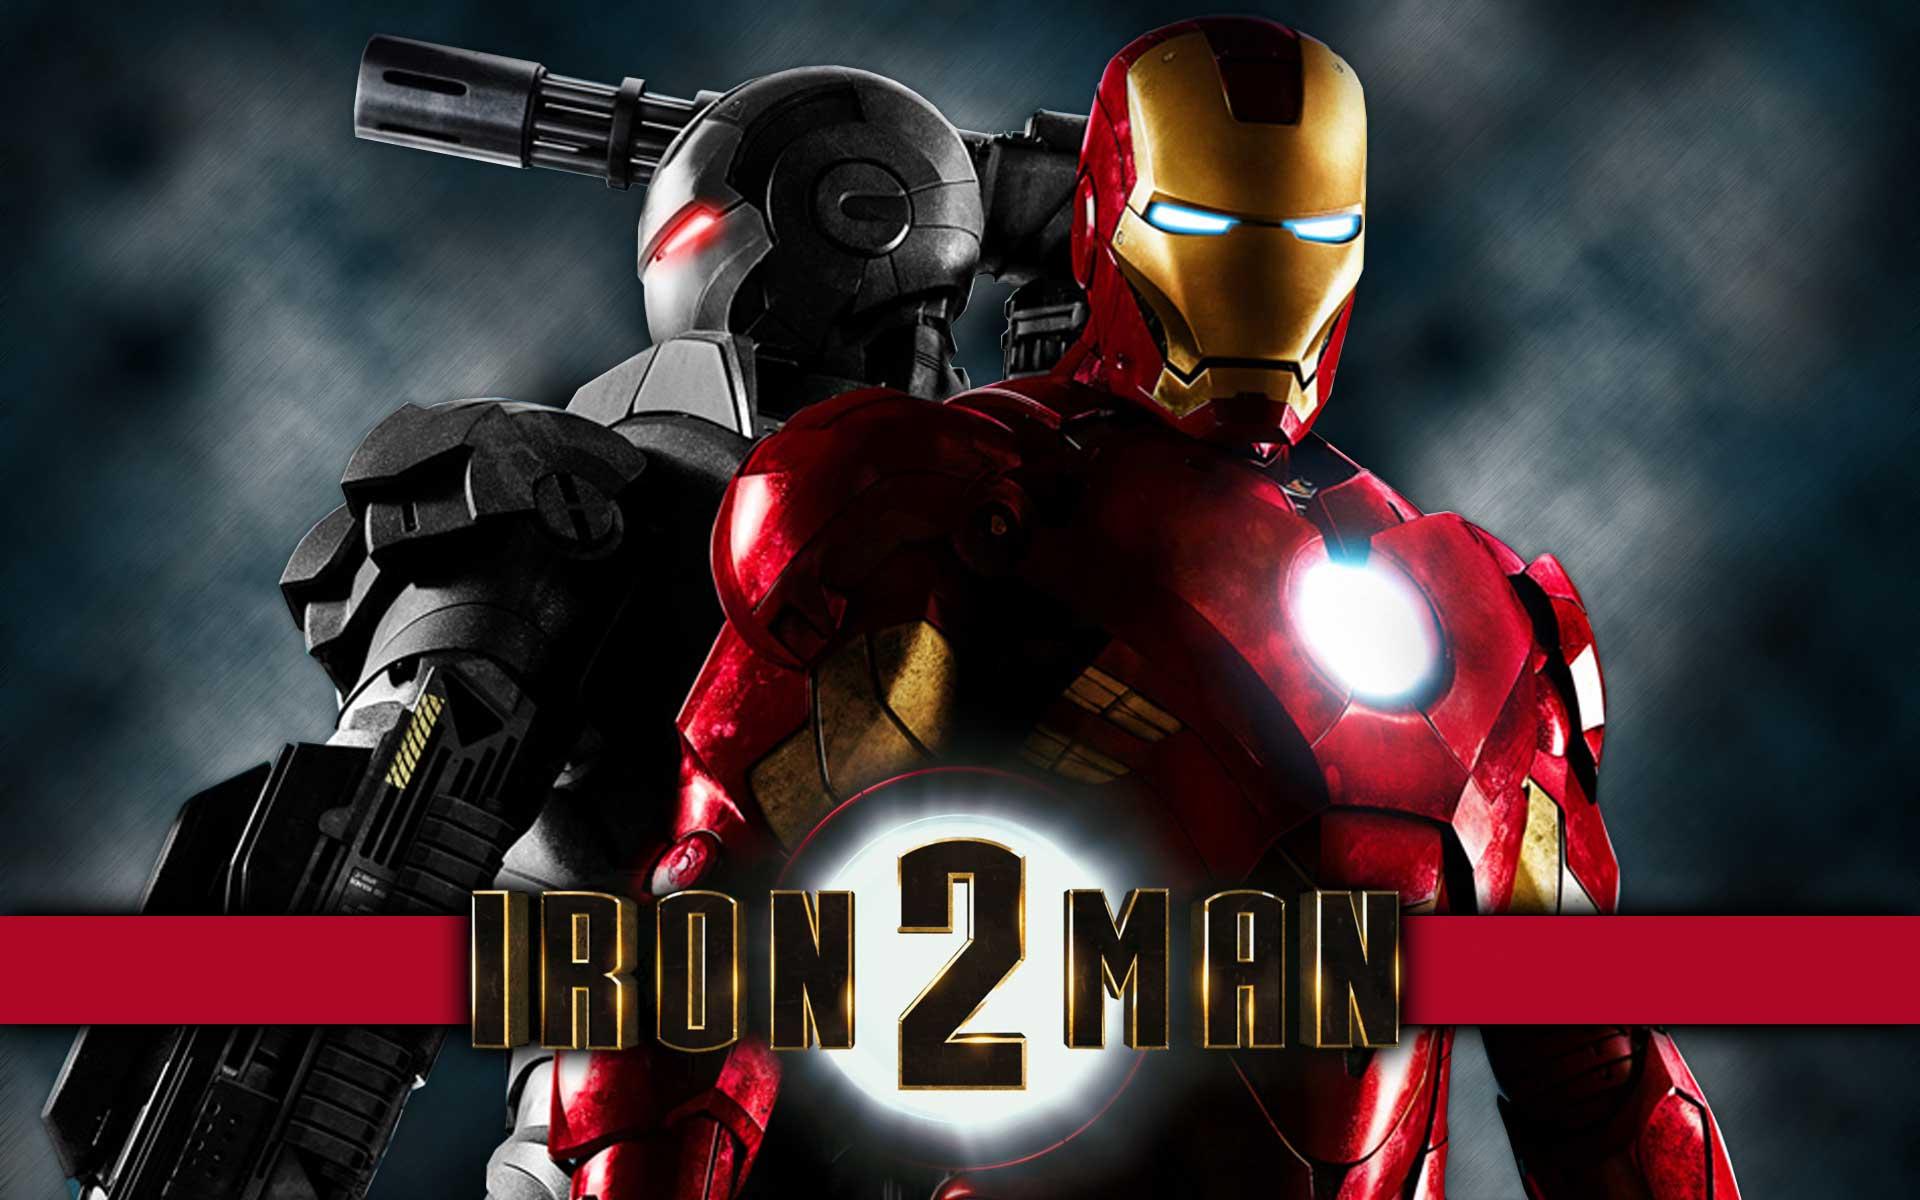 Iron Man 2 Black Widow HD Backgrounds Download HD Wallpapers 1920x1200